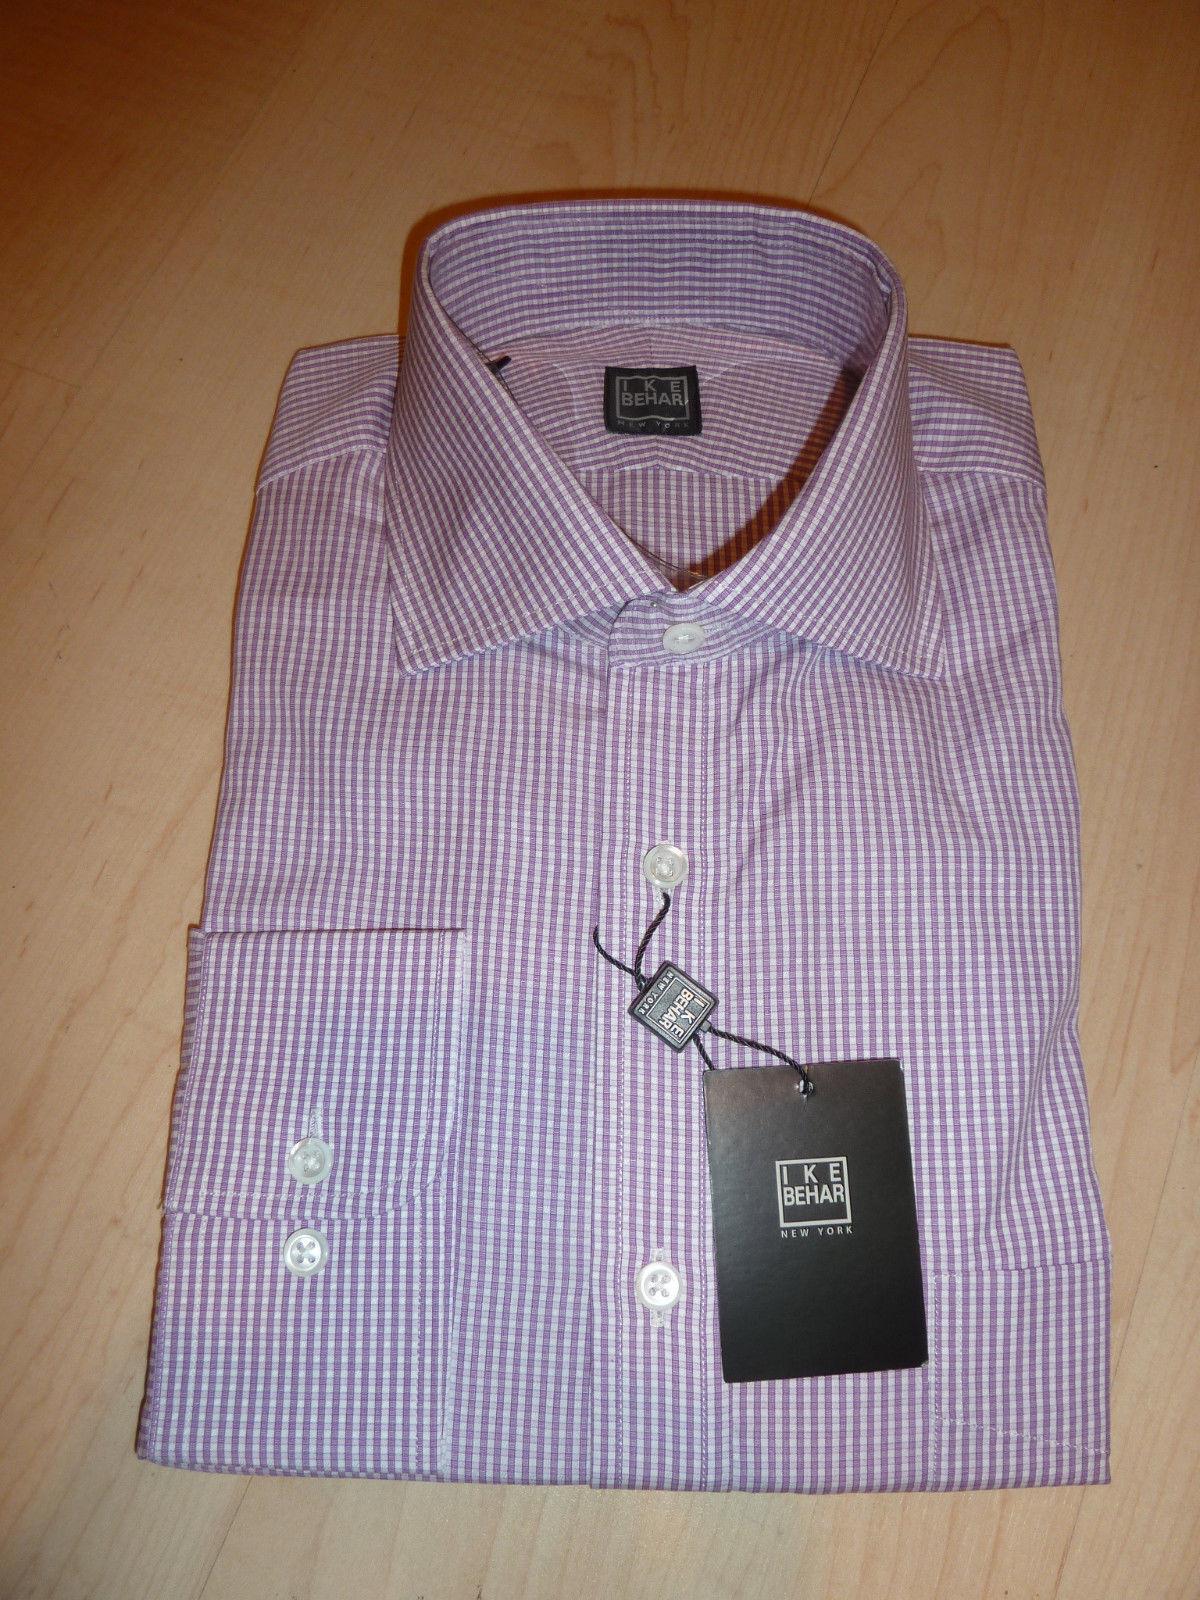 NEW  IKE BEHAR MENS SHIRT Sz 16 34 35 Cotton Purple Concord BC